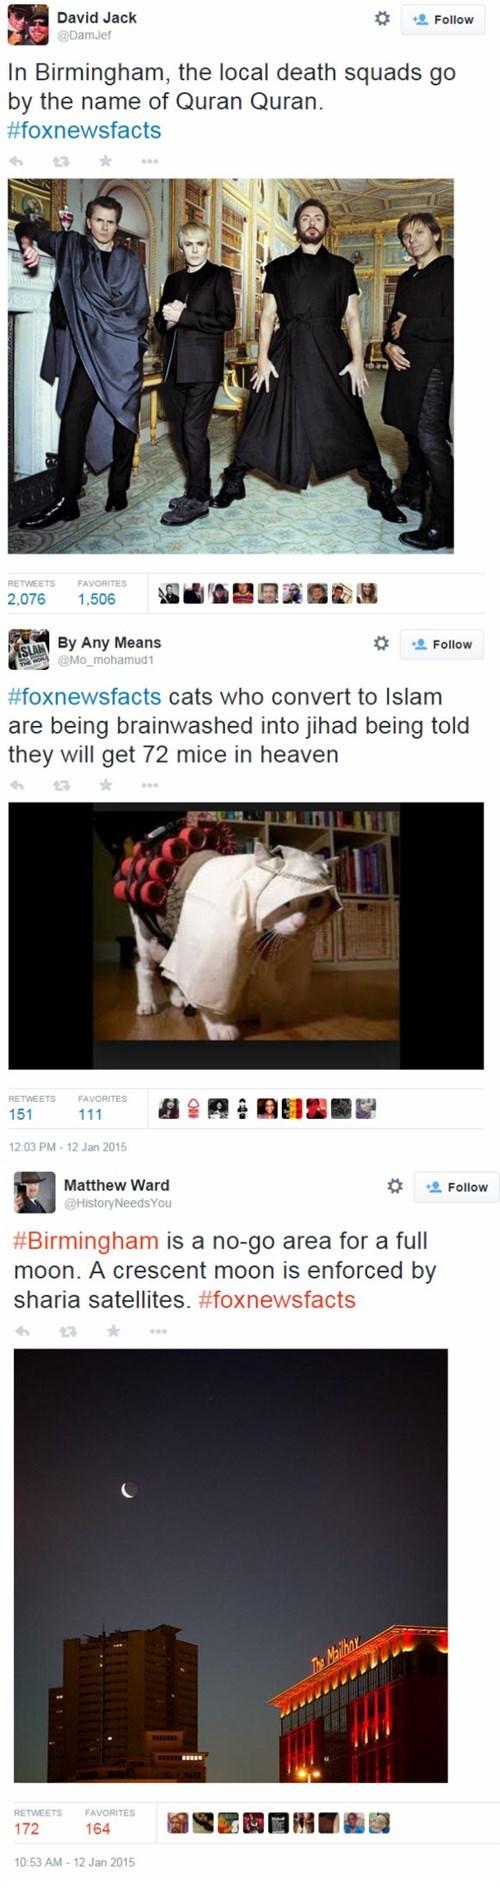 twitter religion facepalm islam UK - 8425062144